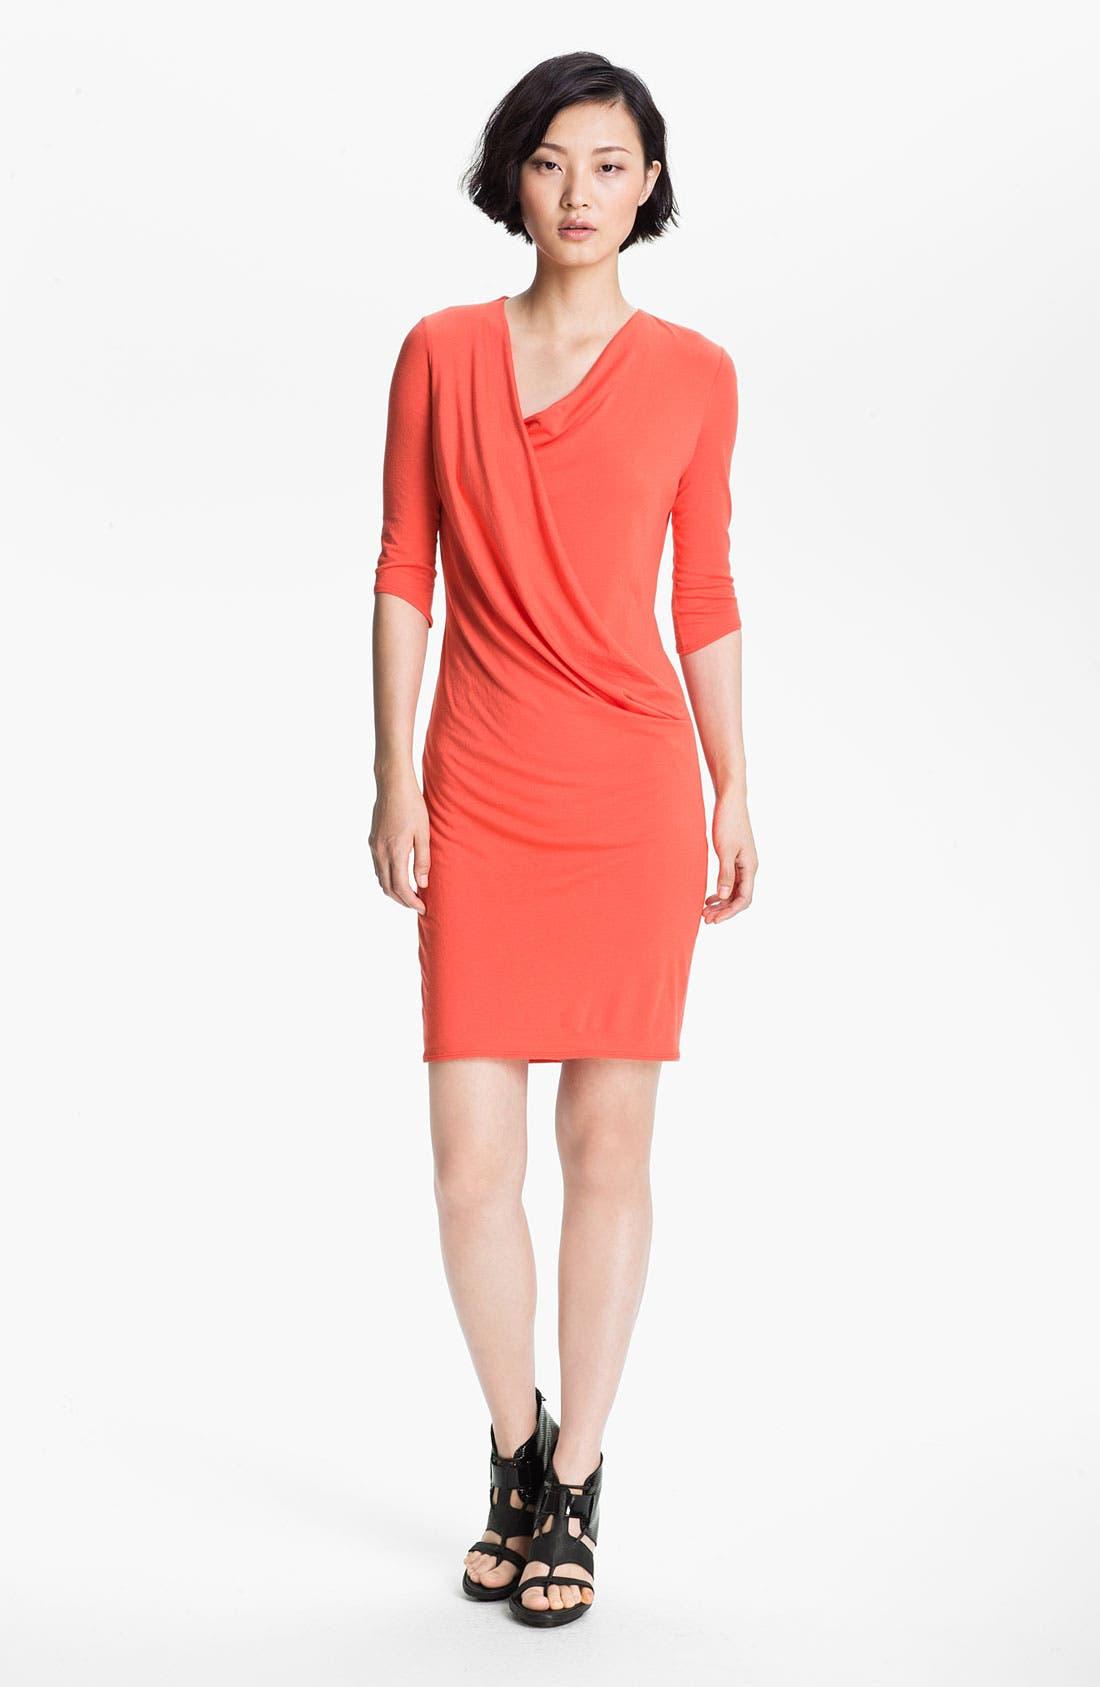 Alternate Image 1 Selected - HELMUT Helmut Lang 'Feather' Draped Jersey Dress